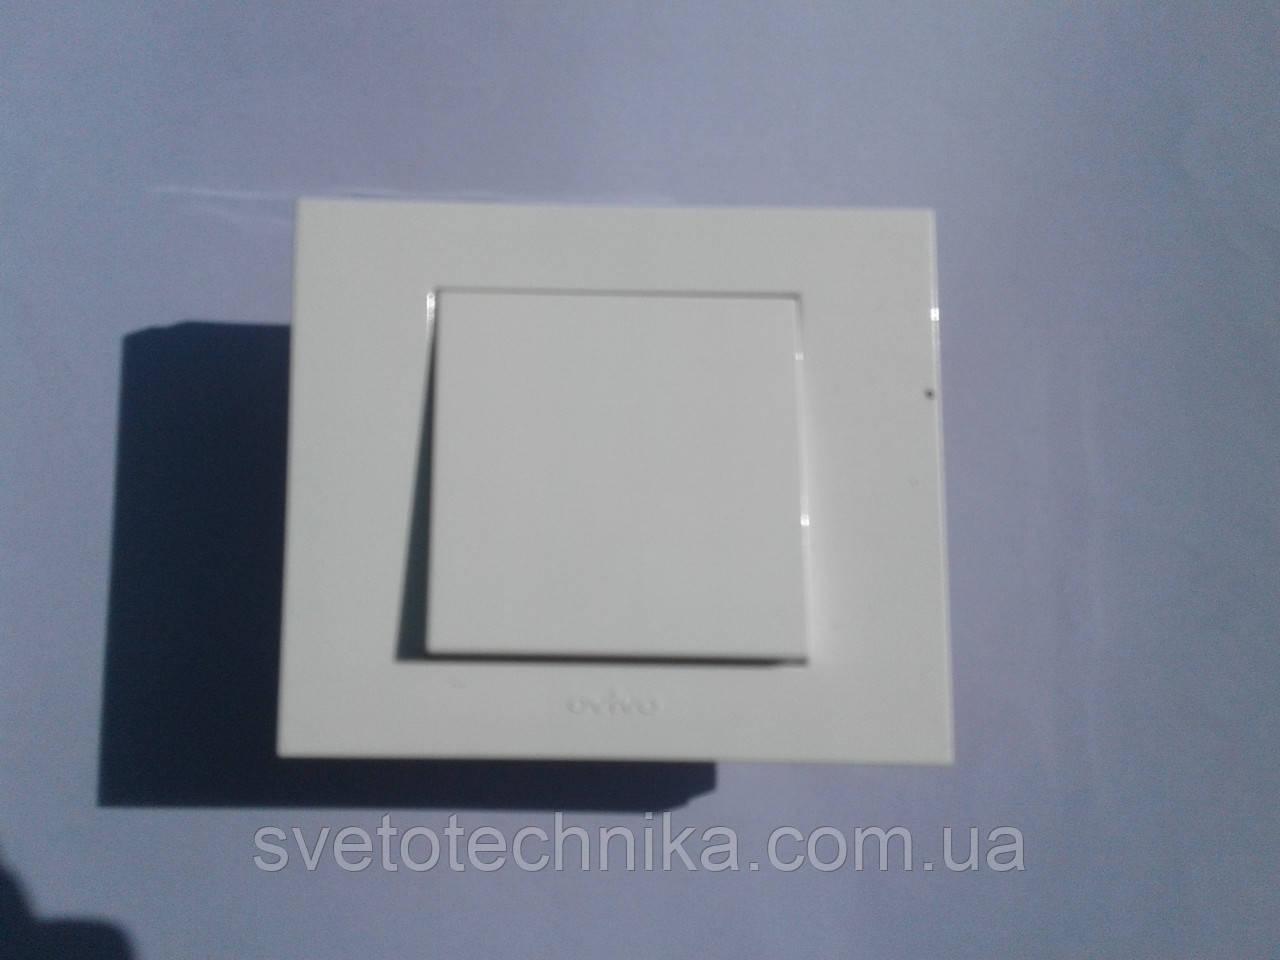 Выключатель одноклавишный OVIVO Grano  (белый)